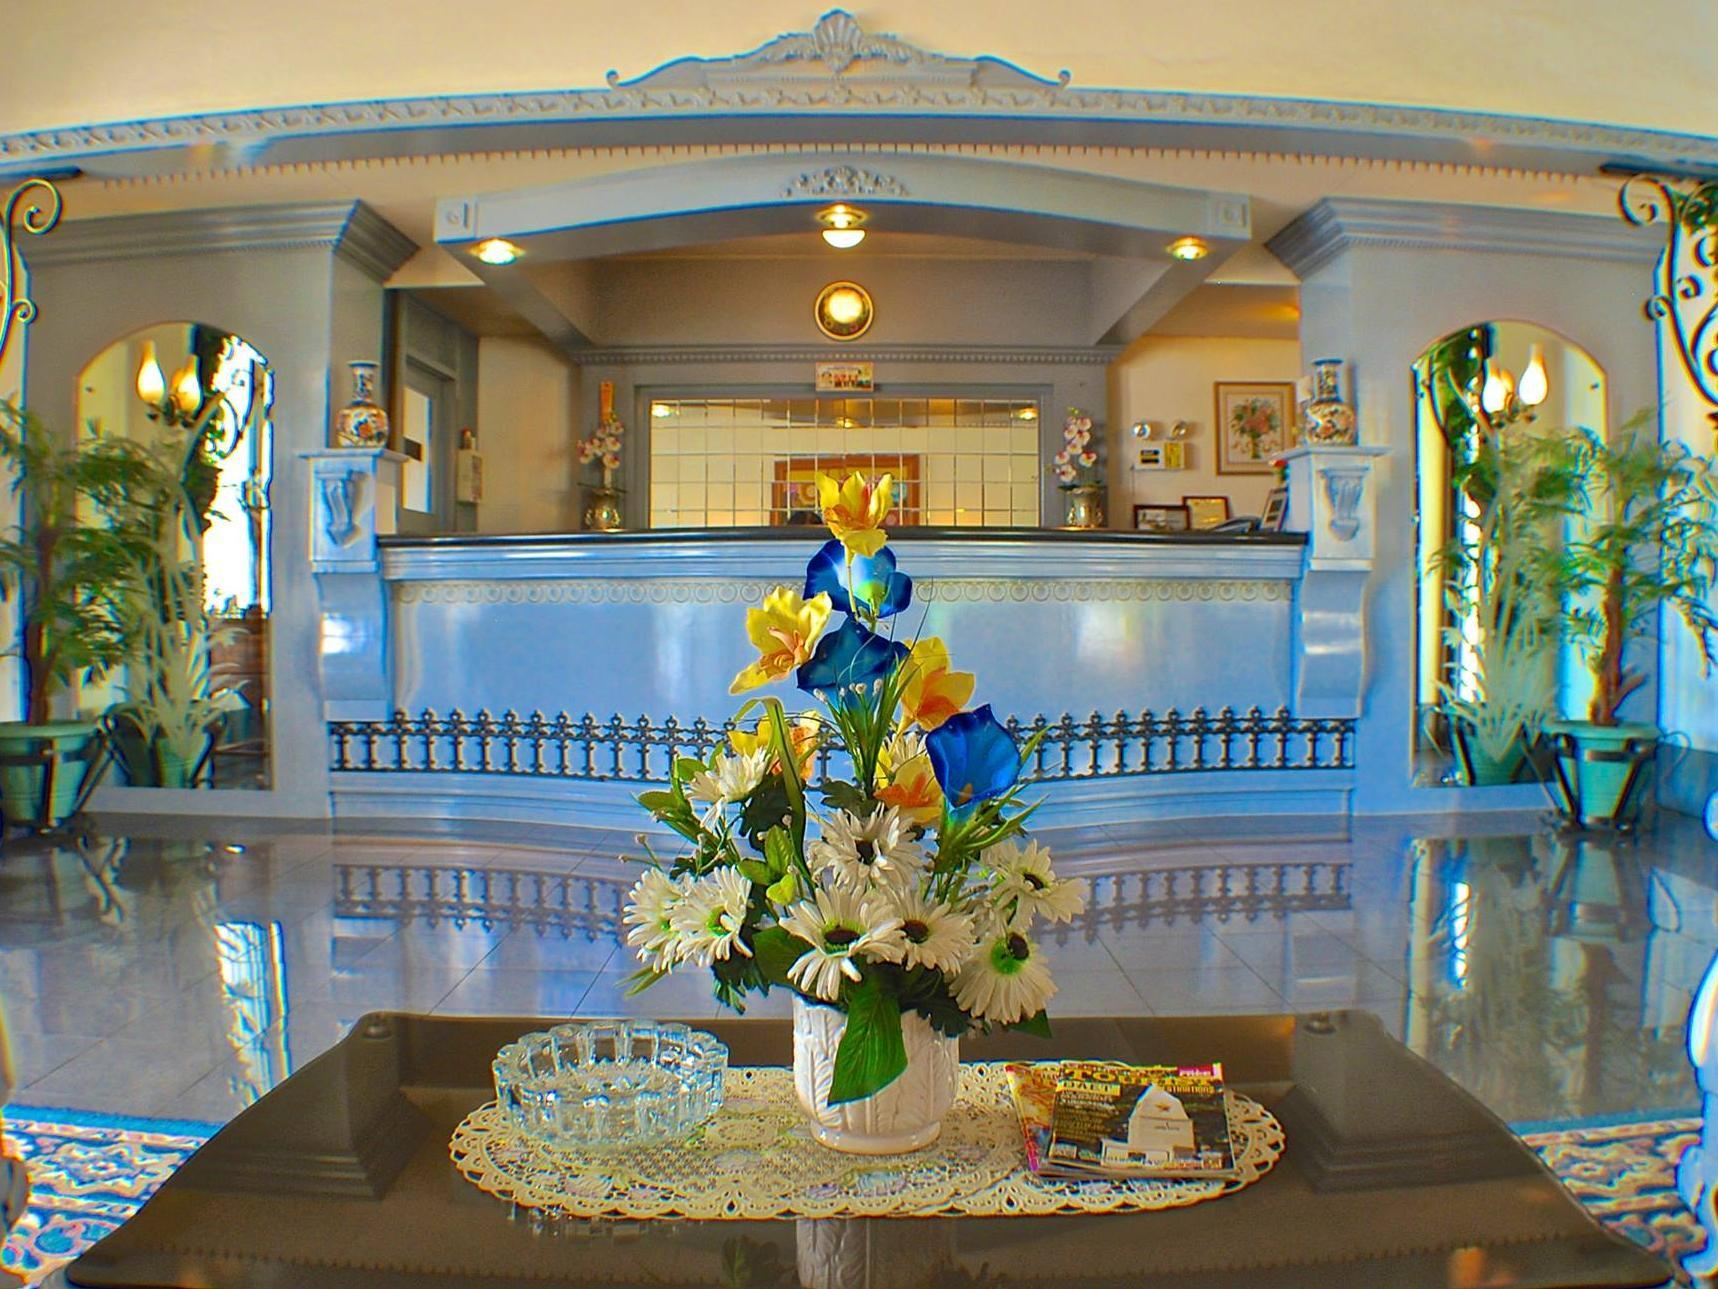 SM Travelodge Hotel & Restaurant, Batangas City